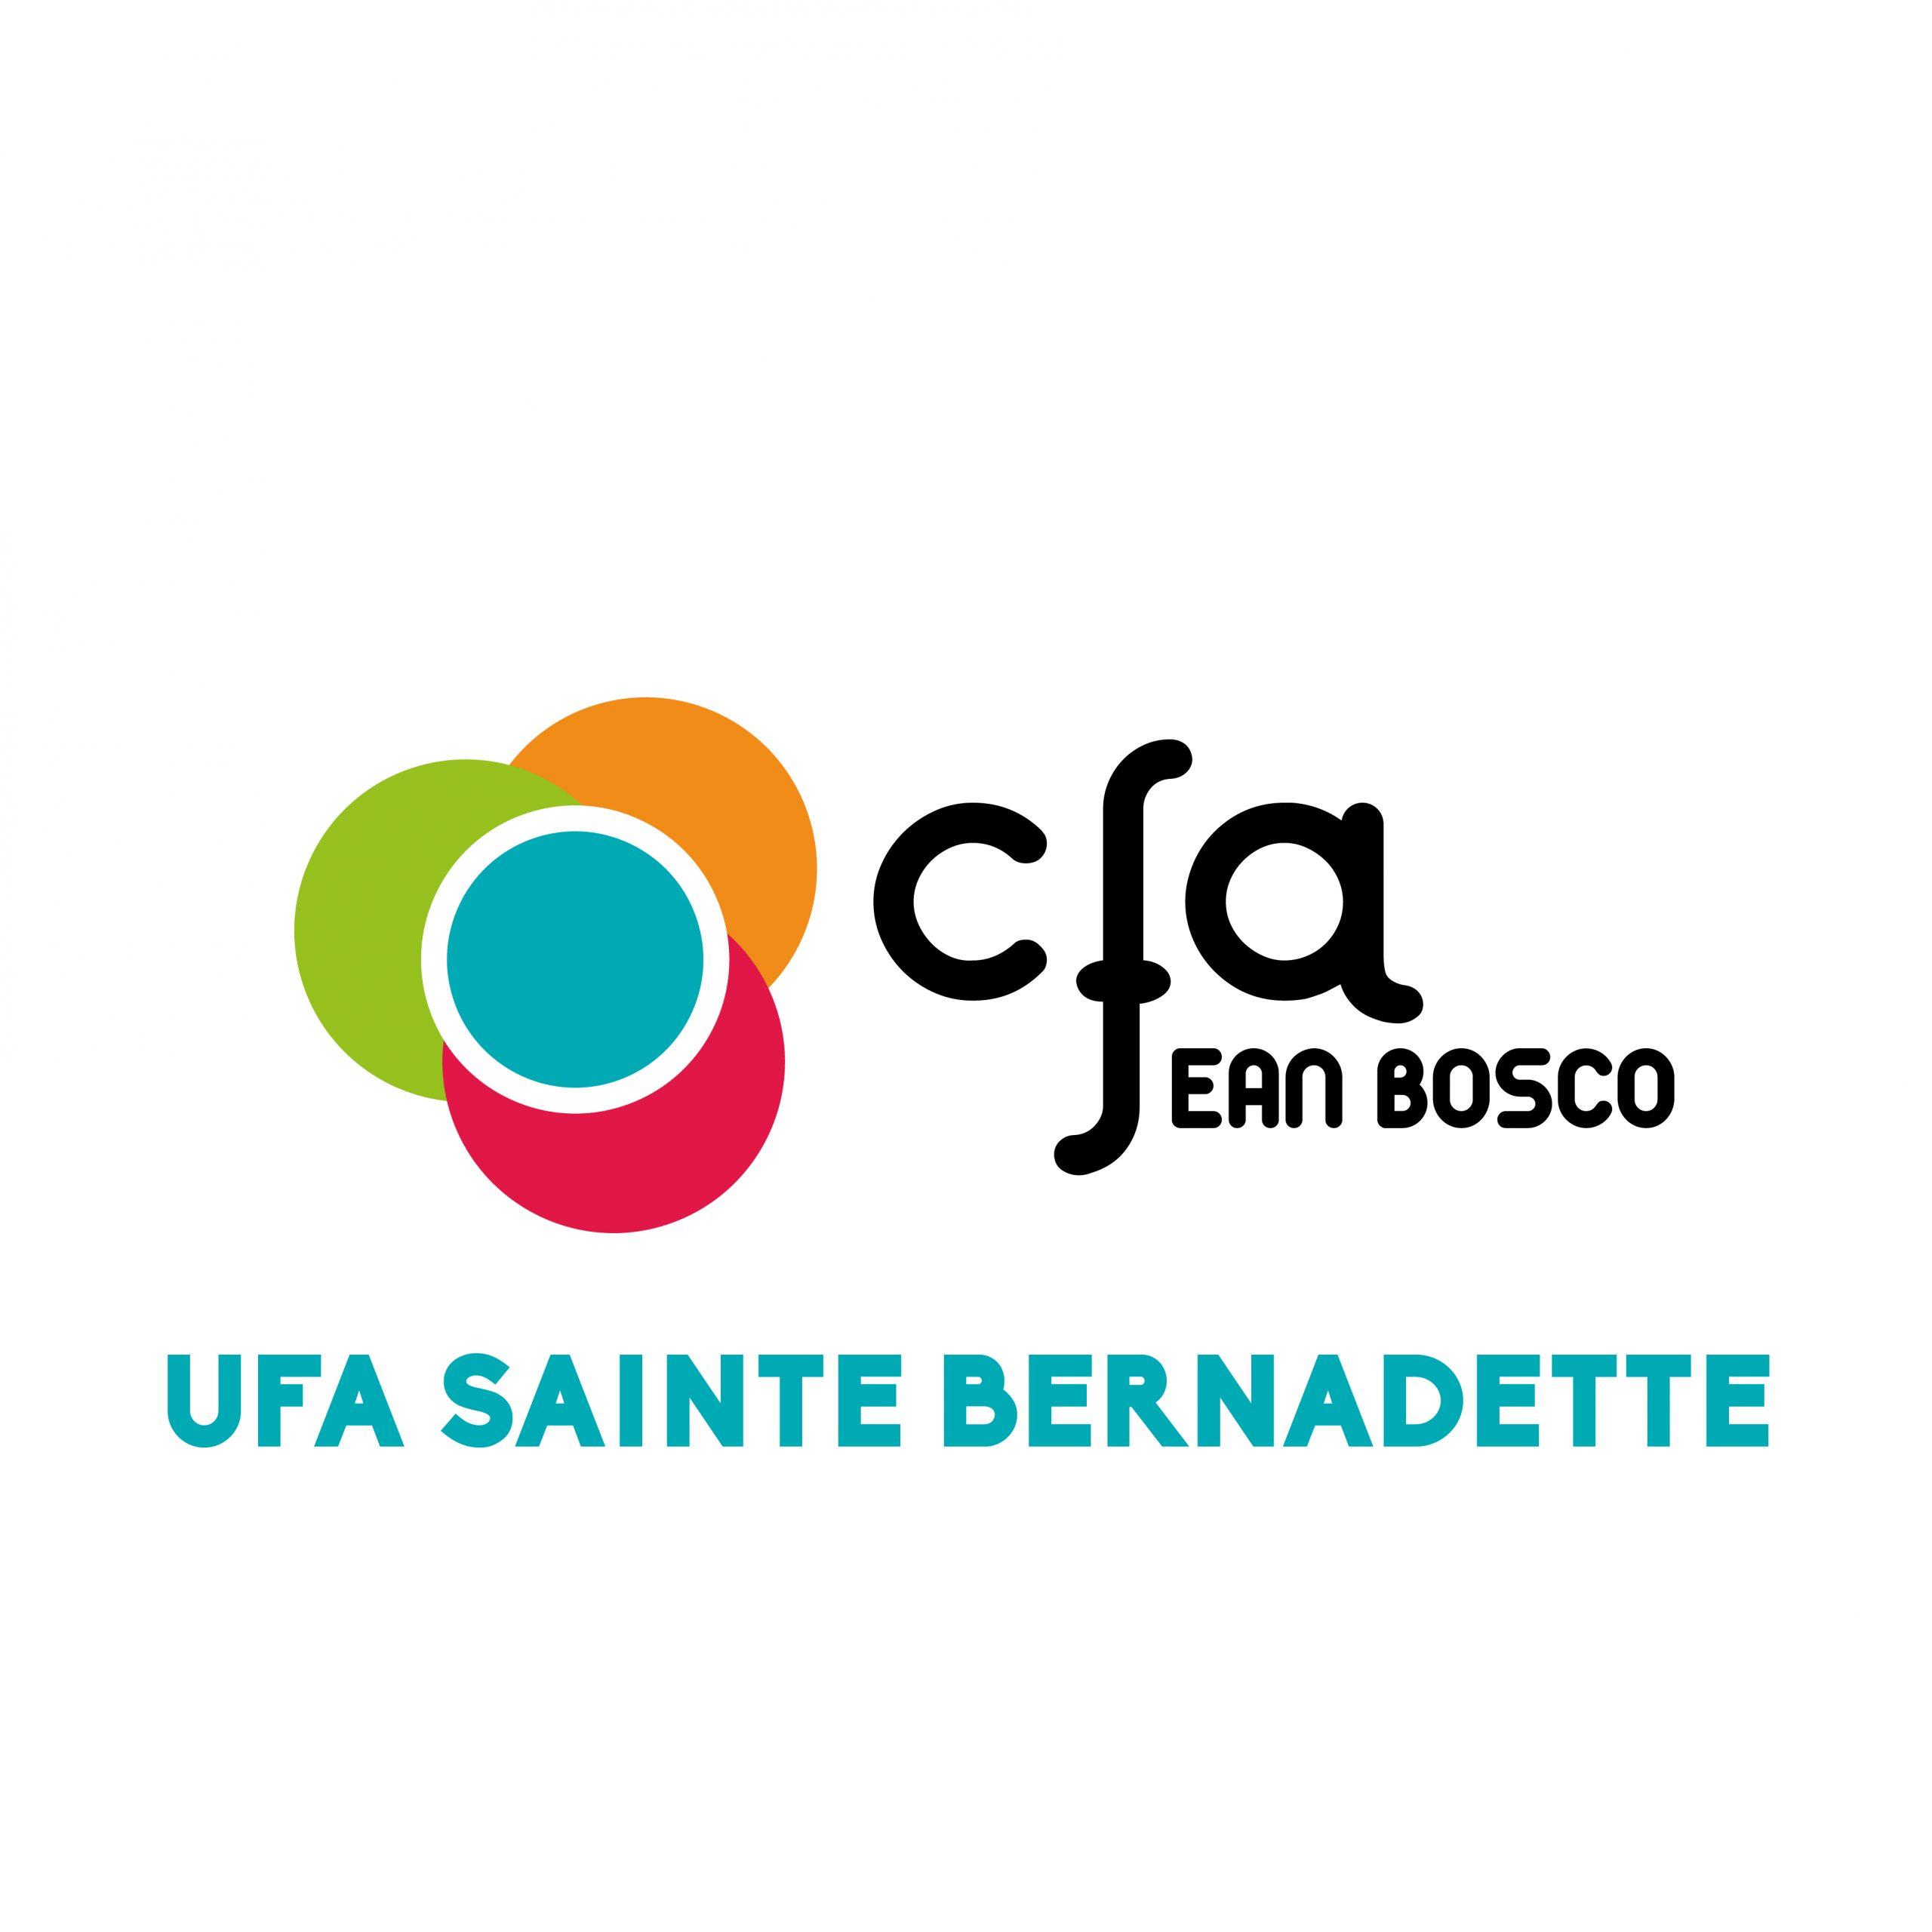 UFA SAINTE BERNADETTE